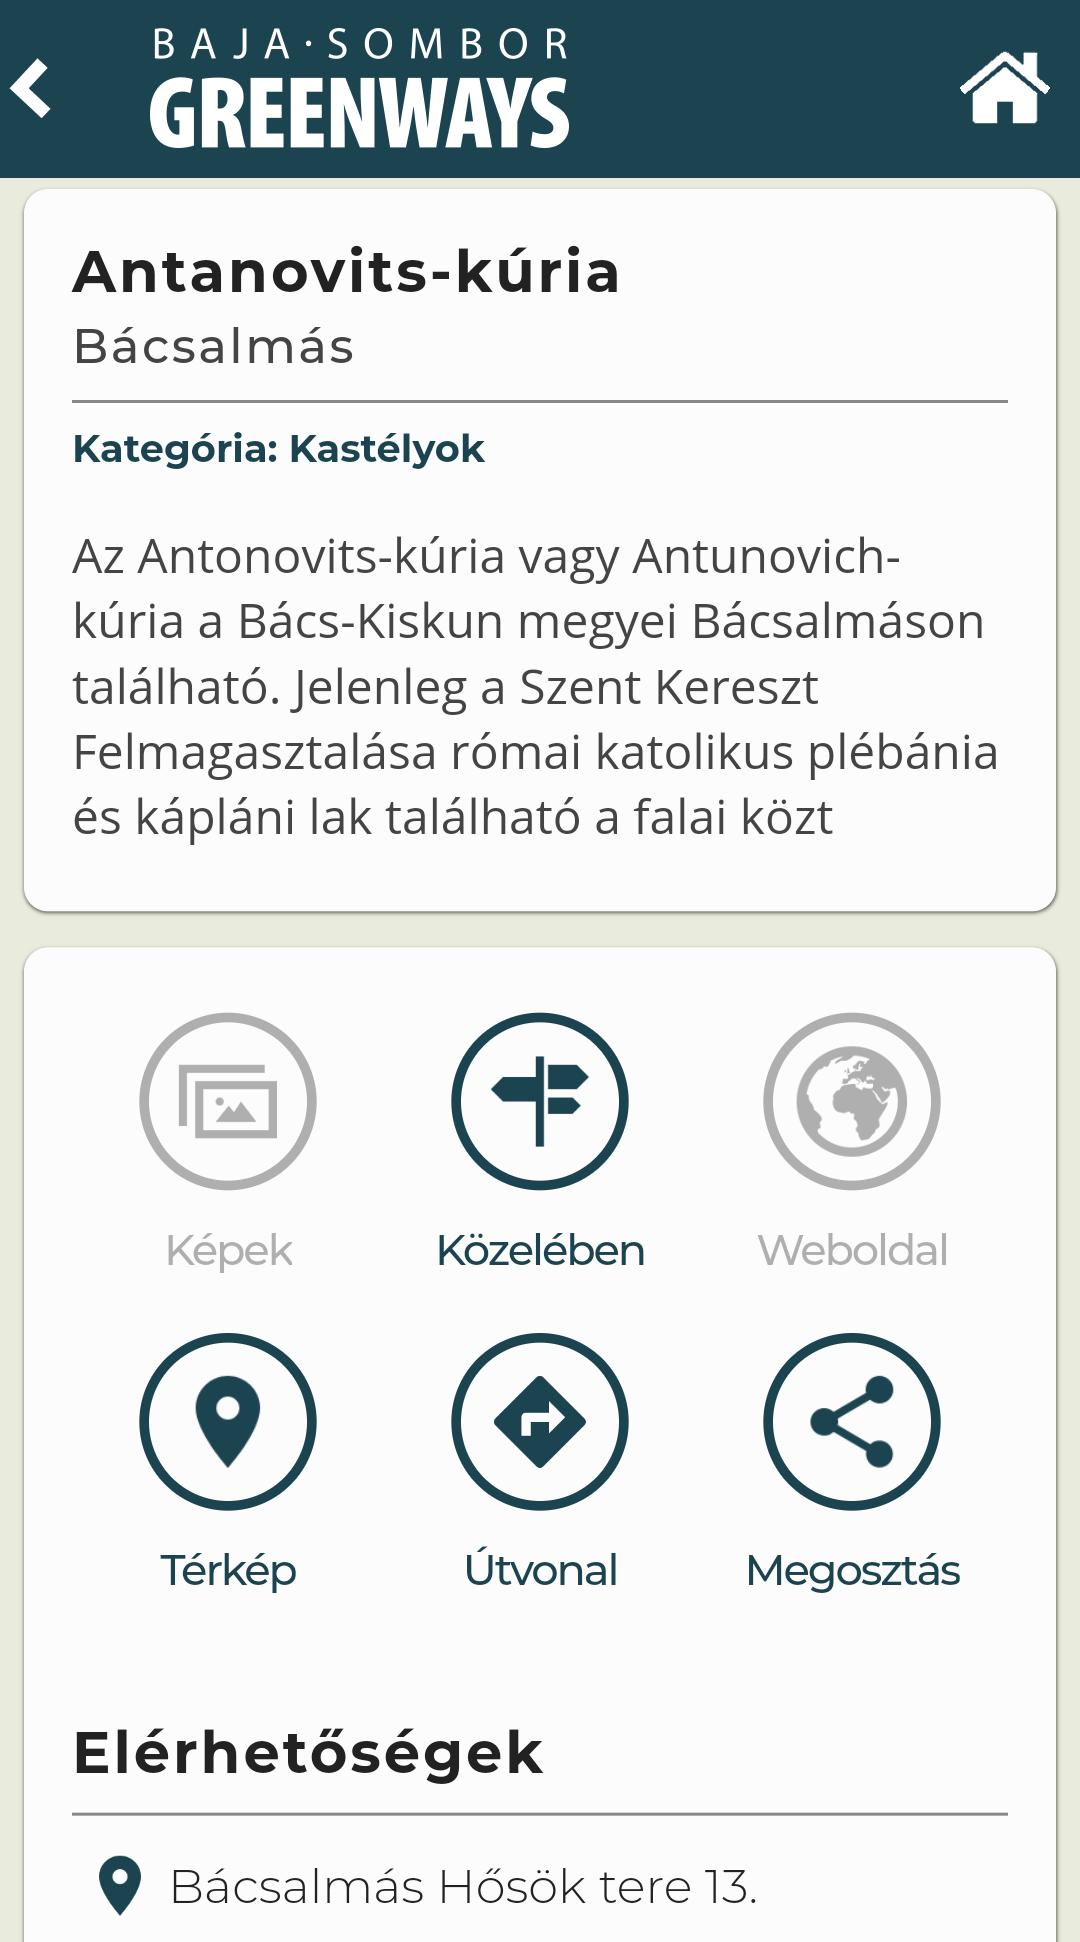 bsg_screens_latnivalo